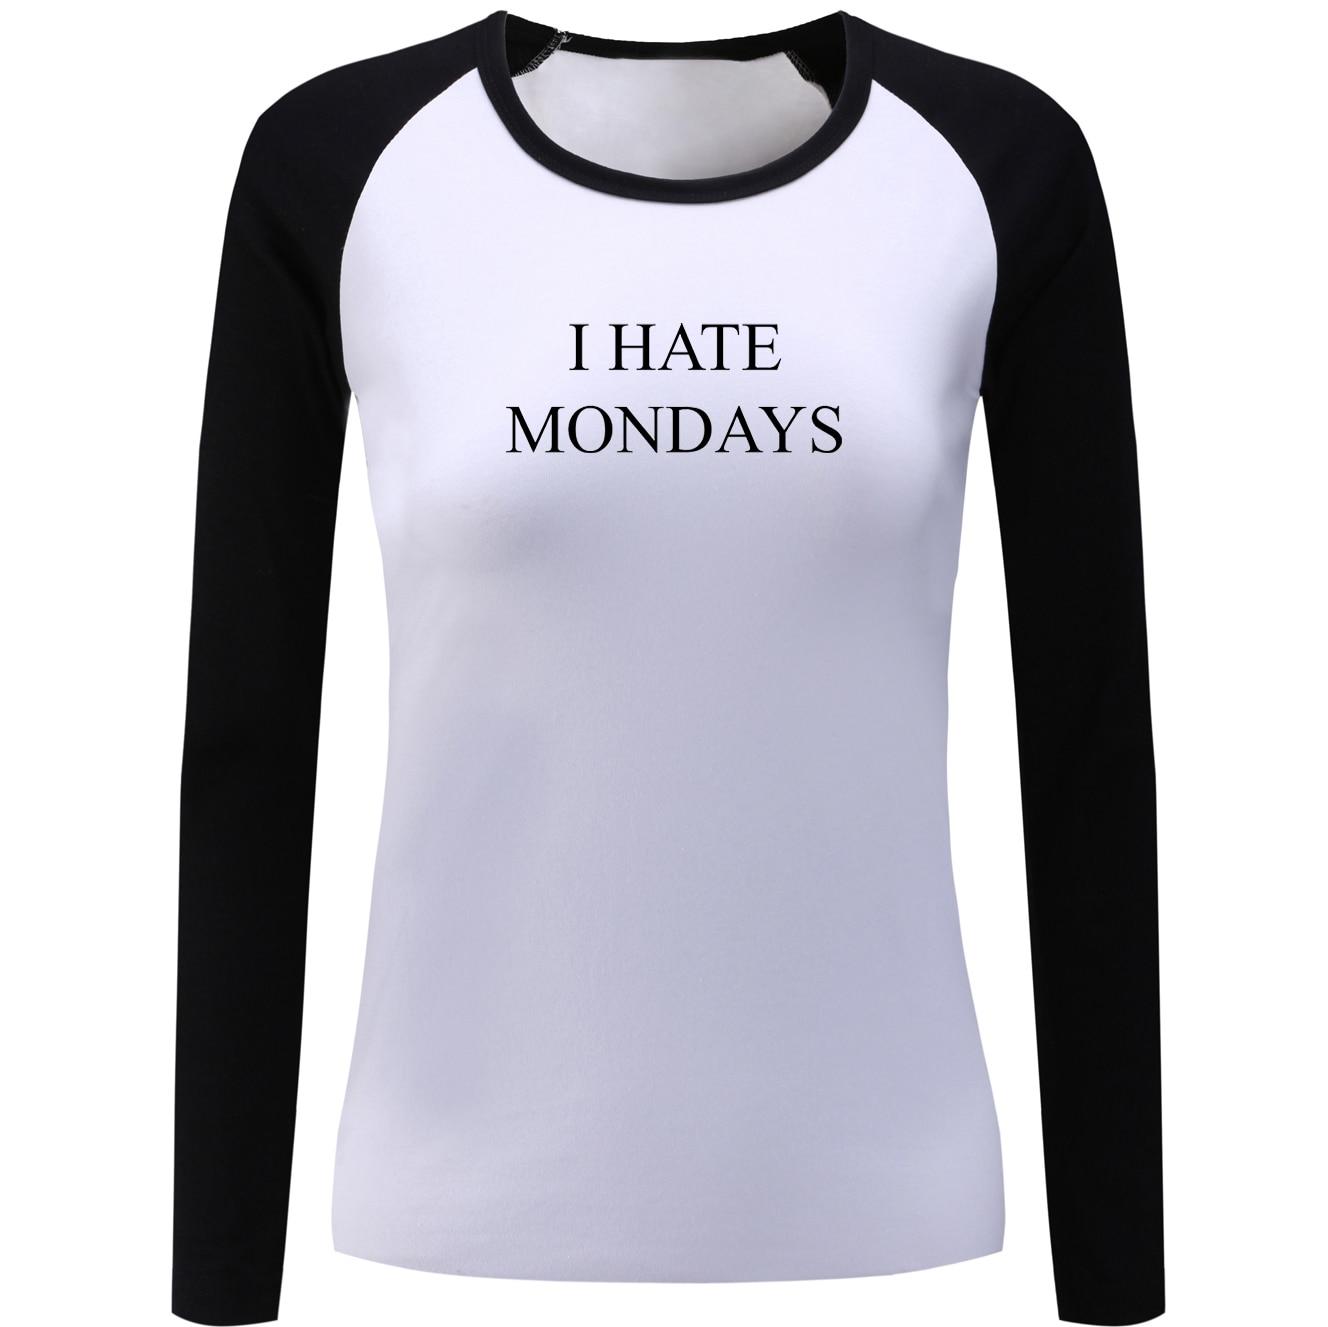 iDzn I Hate Mondays Funny Women's Raglan T Shirt Fashion Patchwork Female Long Sleeve T-shirt Cotton Clothes Christmas Present